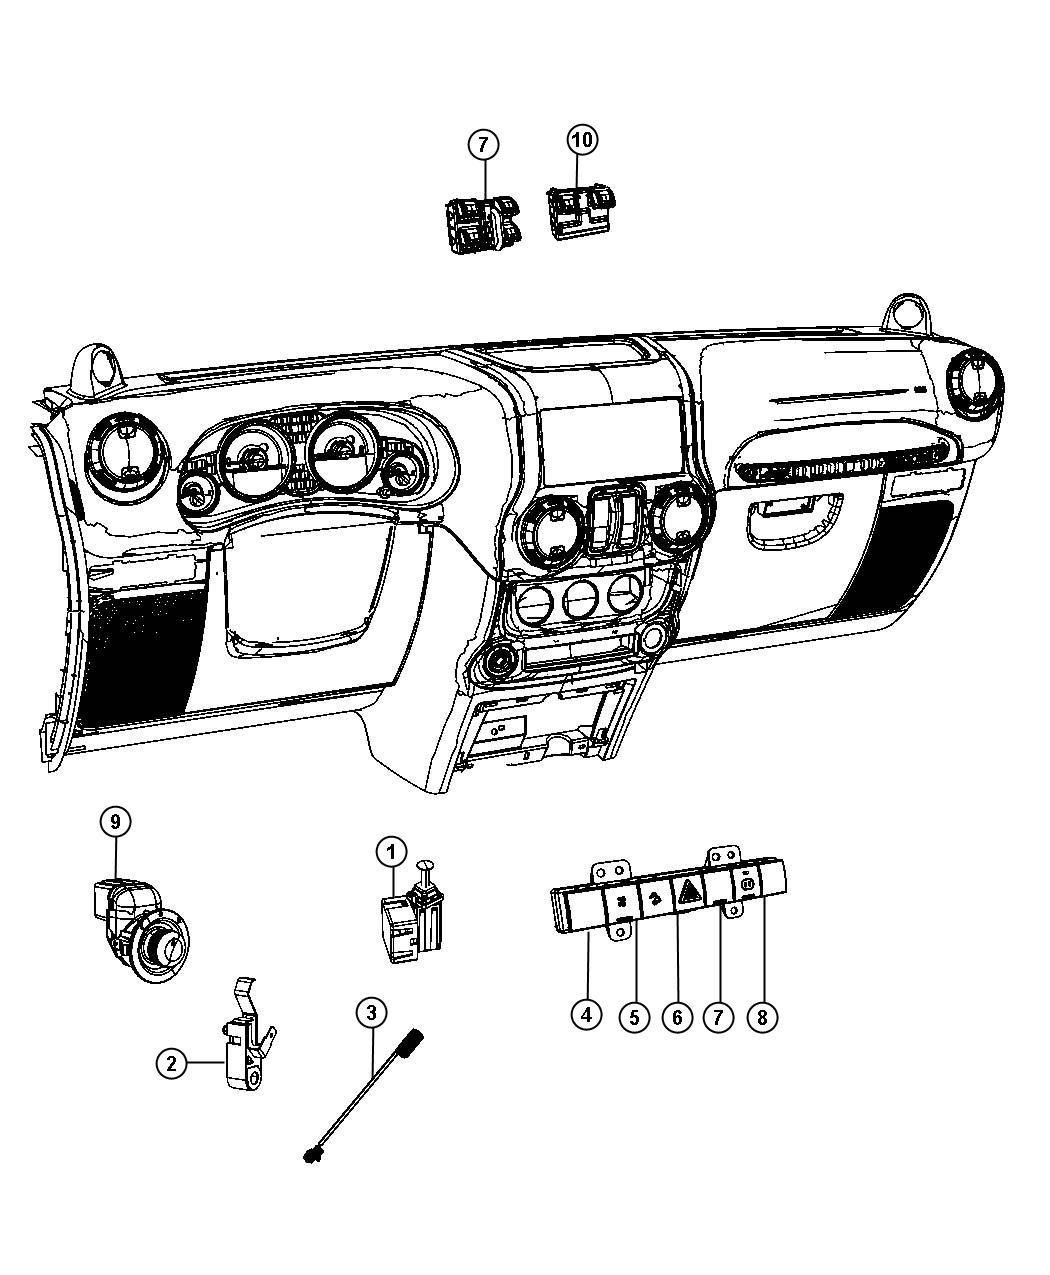 Jeep Wrangler Switch. 5 gang. [bnb], [jkv], [jpm], [bnh